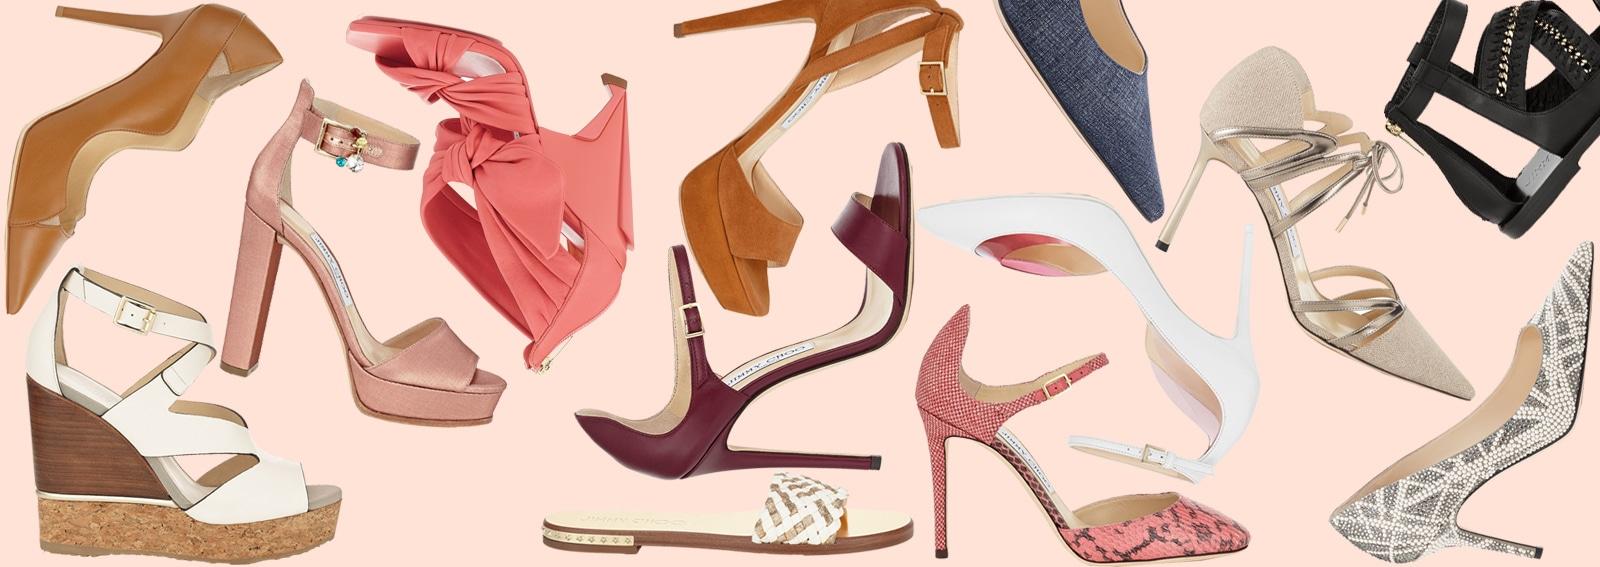 cover scarpe jimmy choo i modelli più belli dekstop